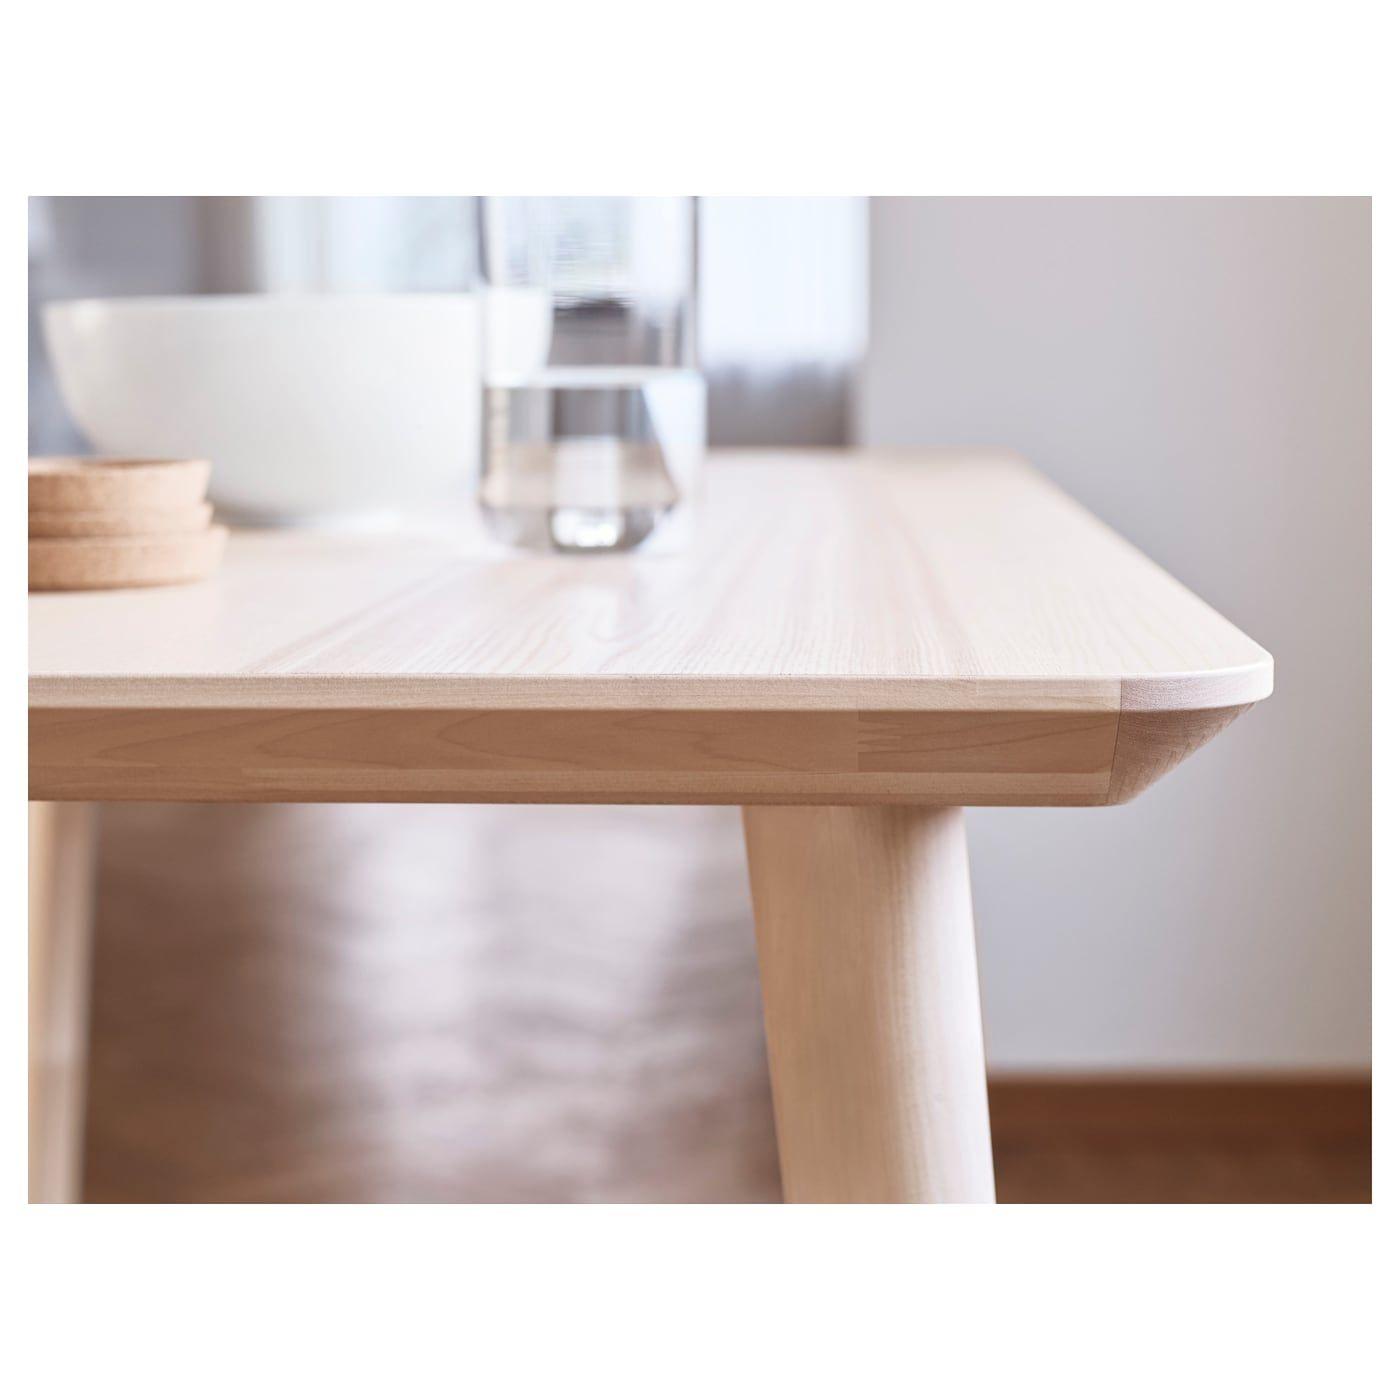 "LISABO Coffee table ash veneer 46 1/2x19 5/8 "" (118x50"